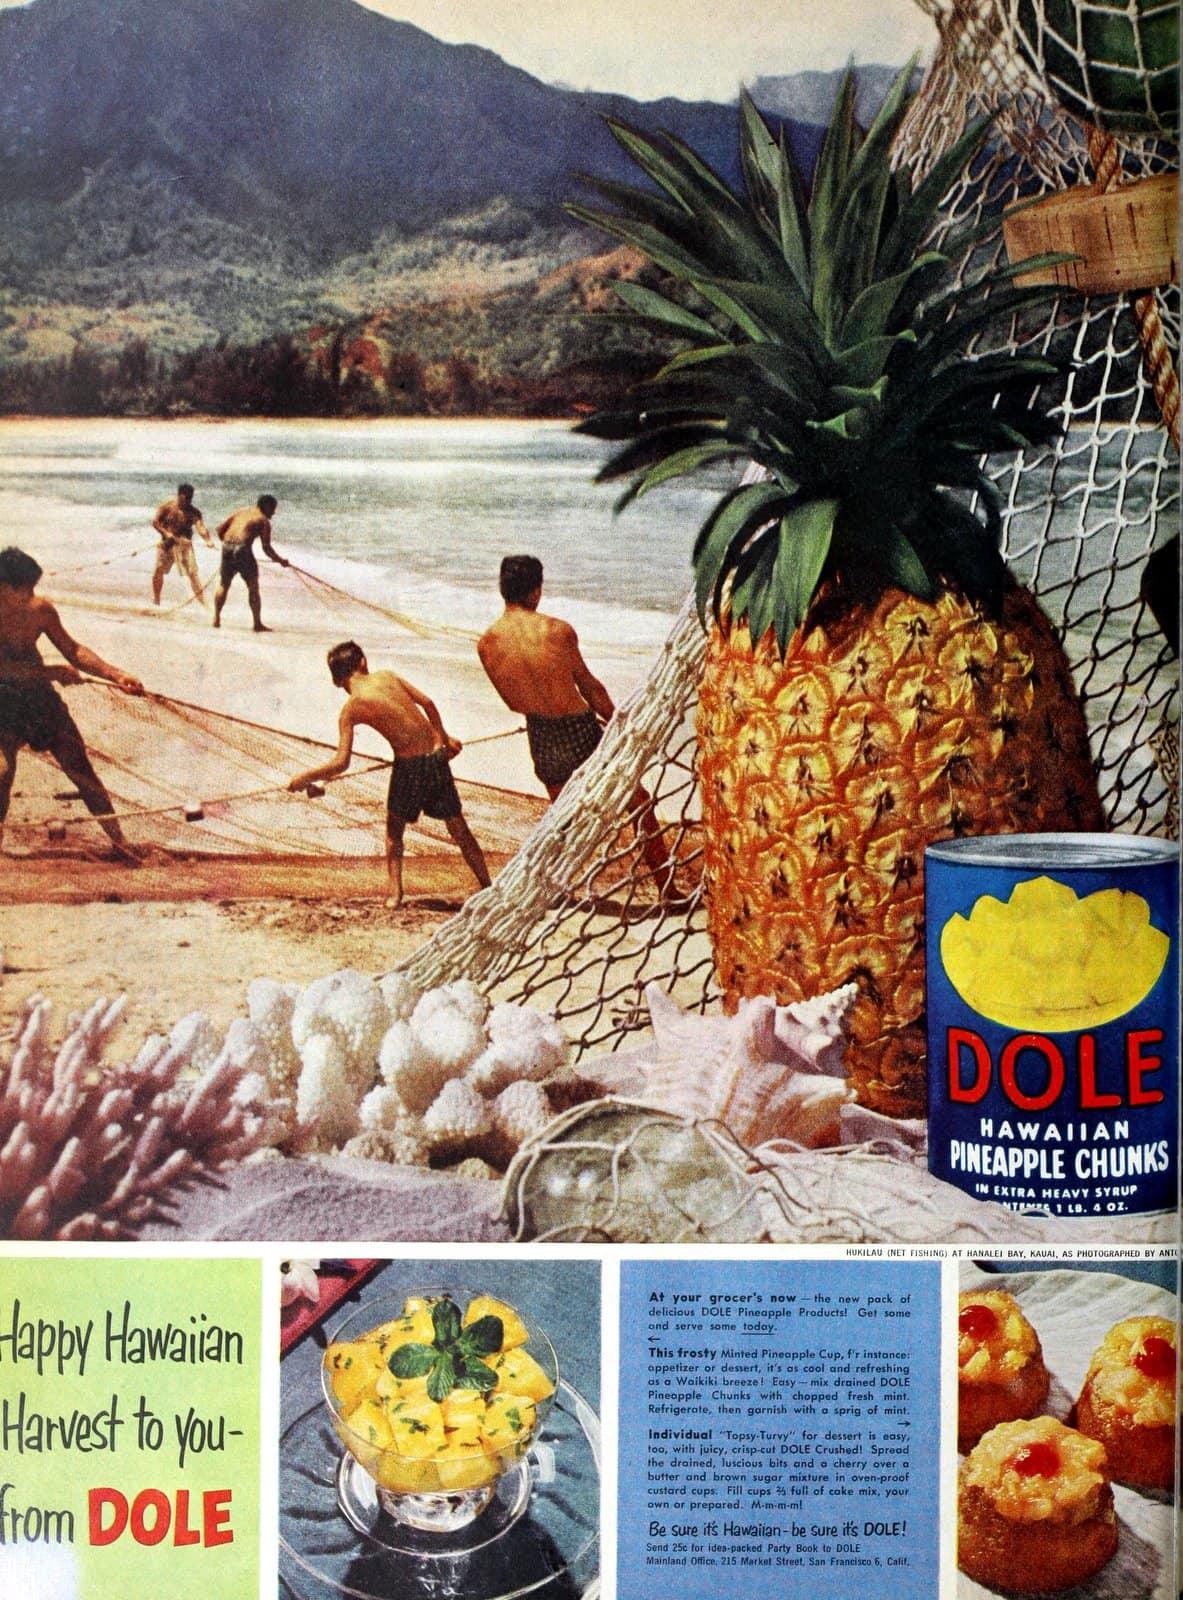 Vintage 1950s tips for serving pineapple